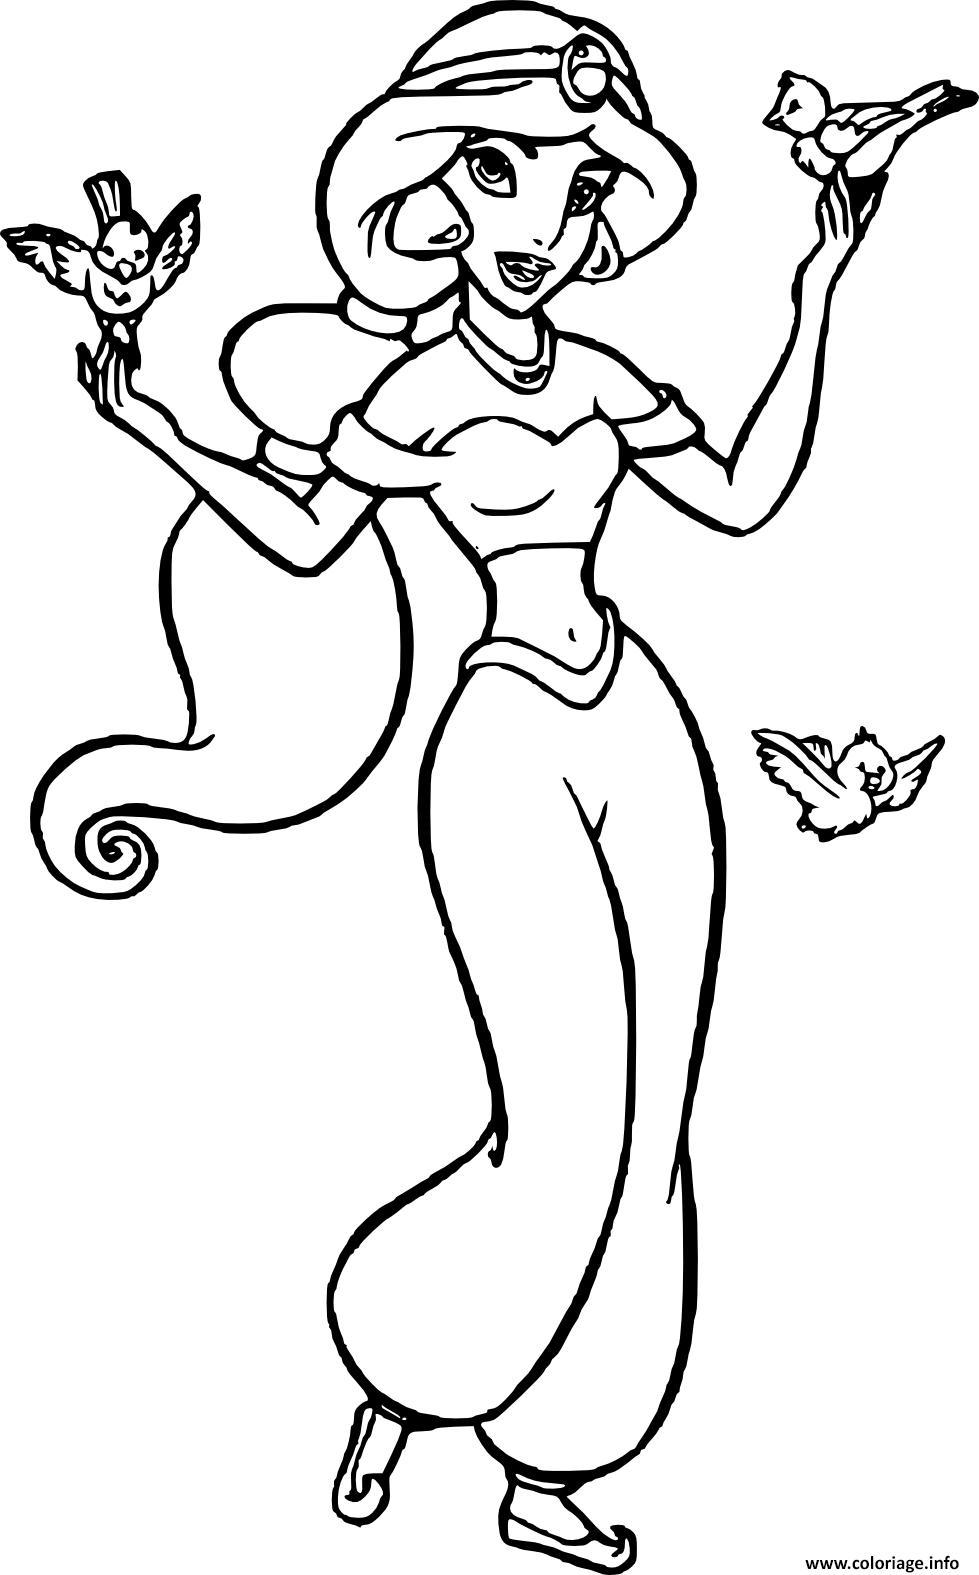 Dessin jasmin femme courageuse et independante dans univers de aladdin disney Coloriage Gratuit à Imprimer